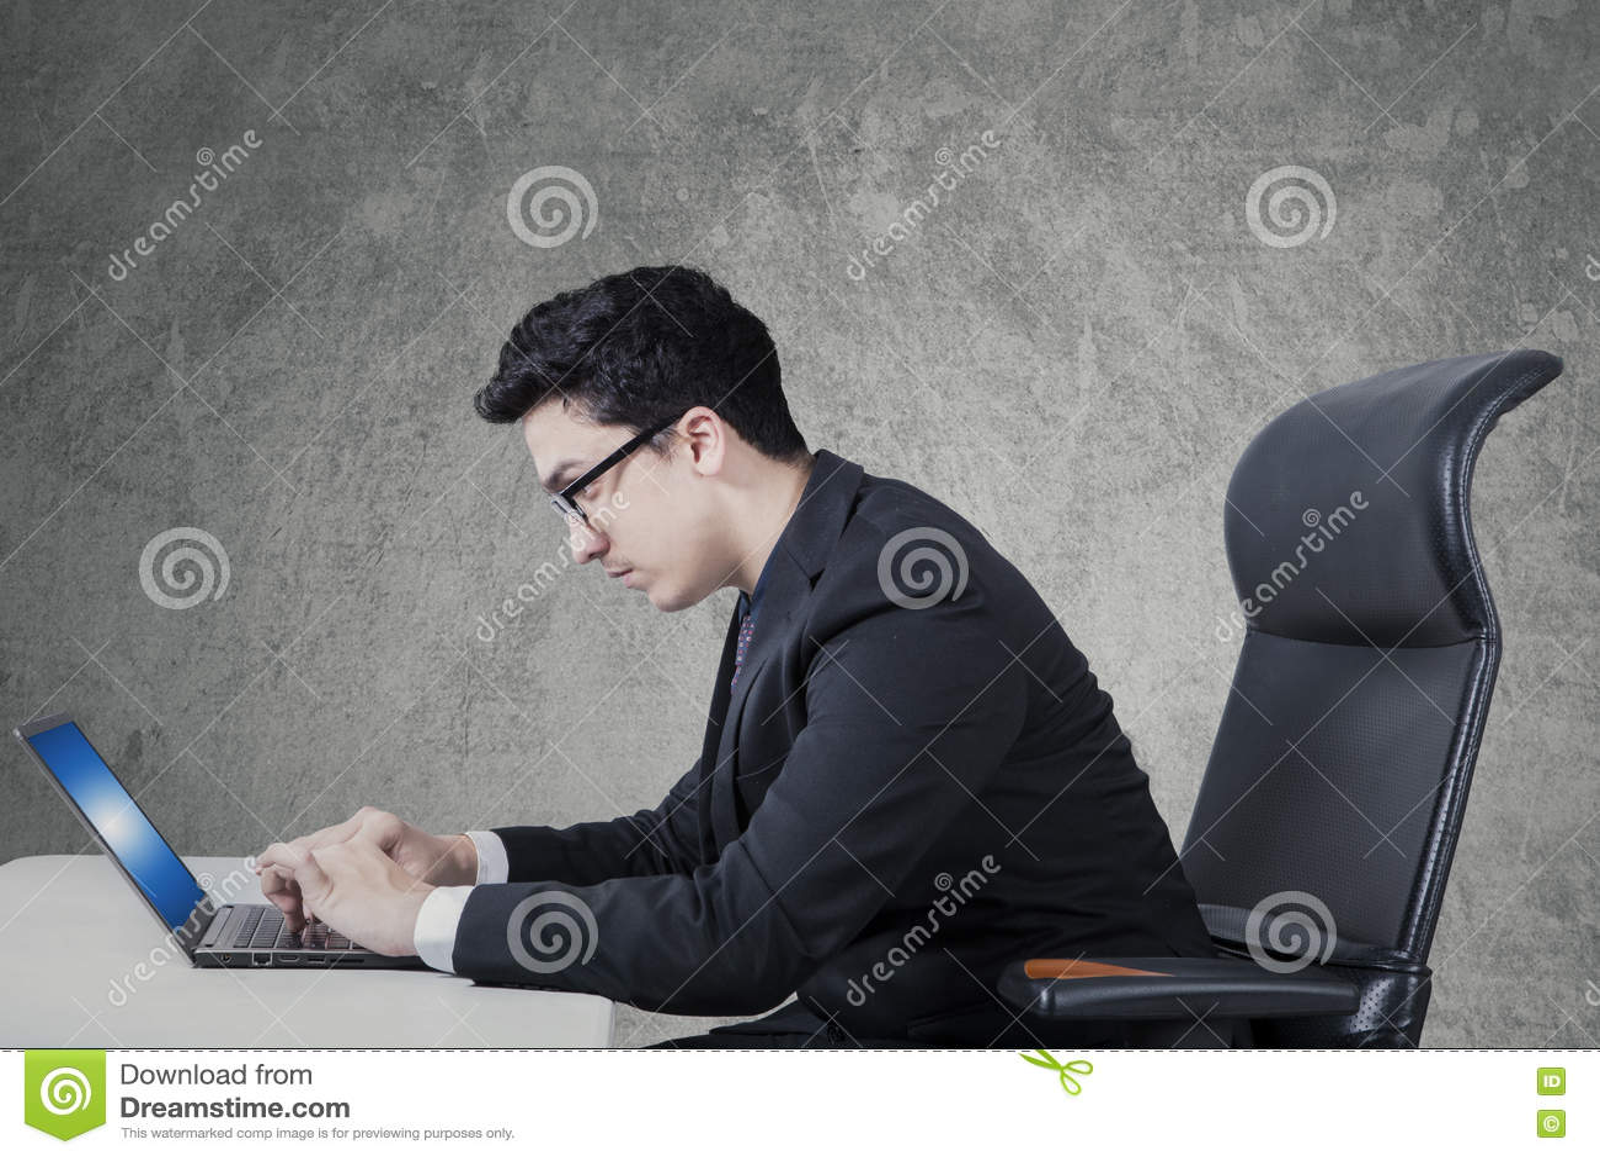 Arabic businessman uses laptop on desk